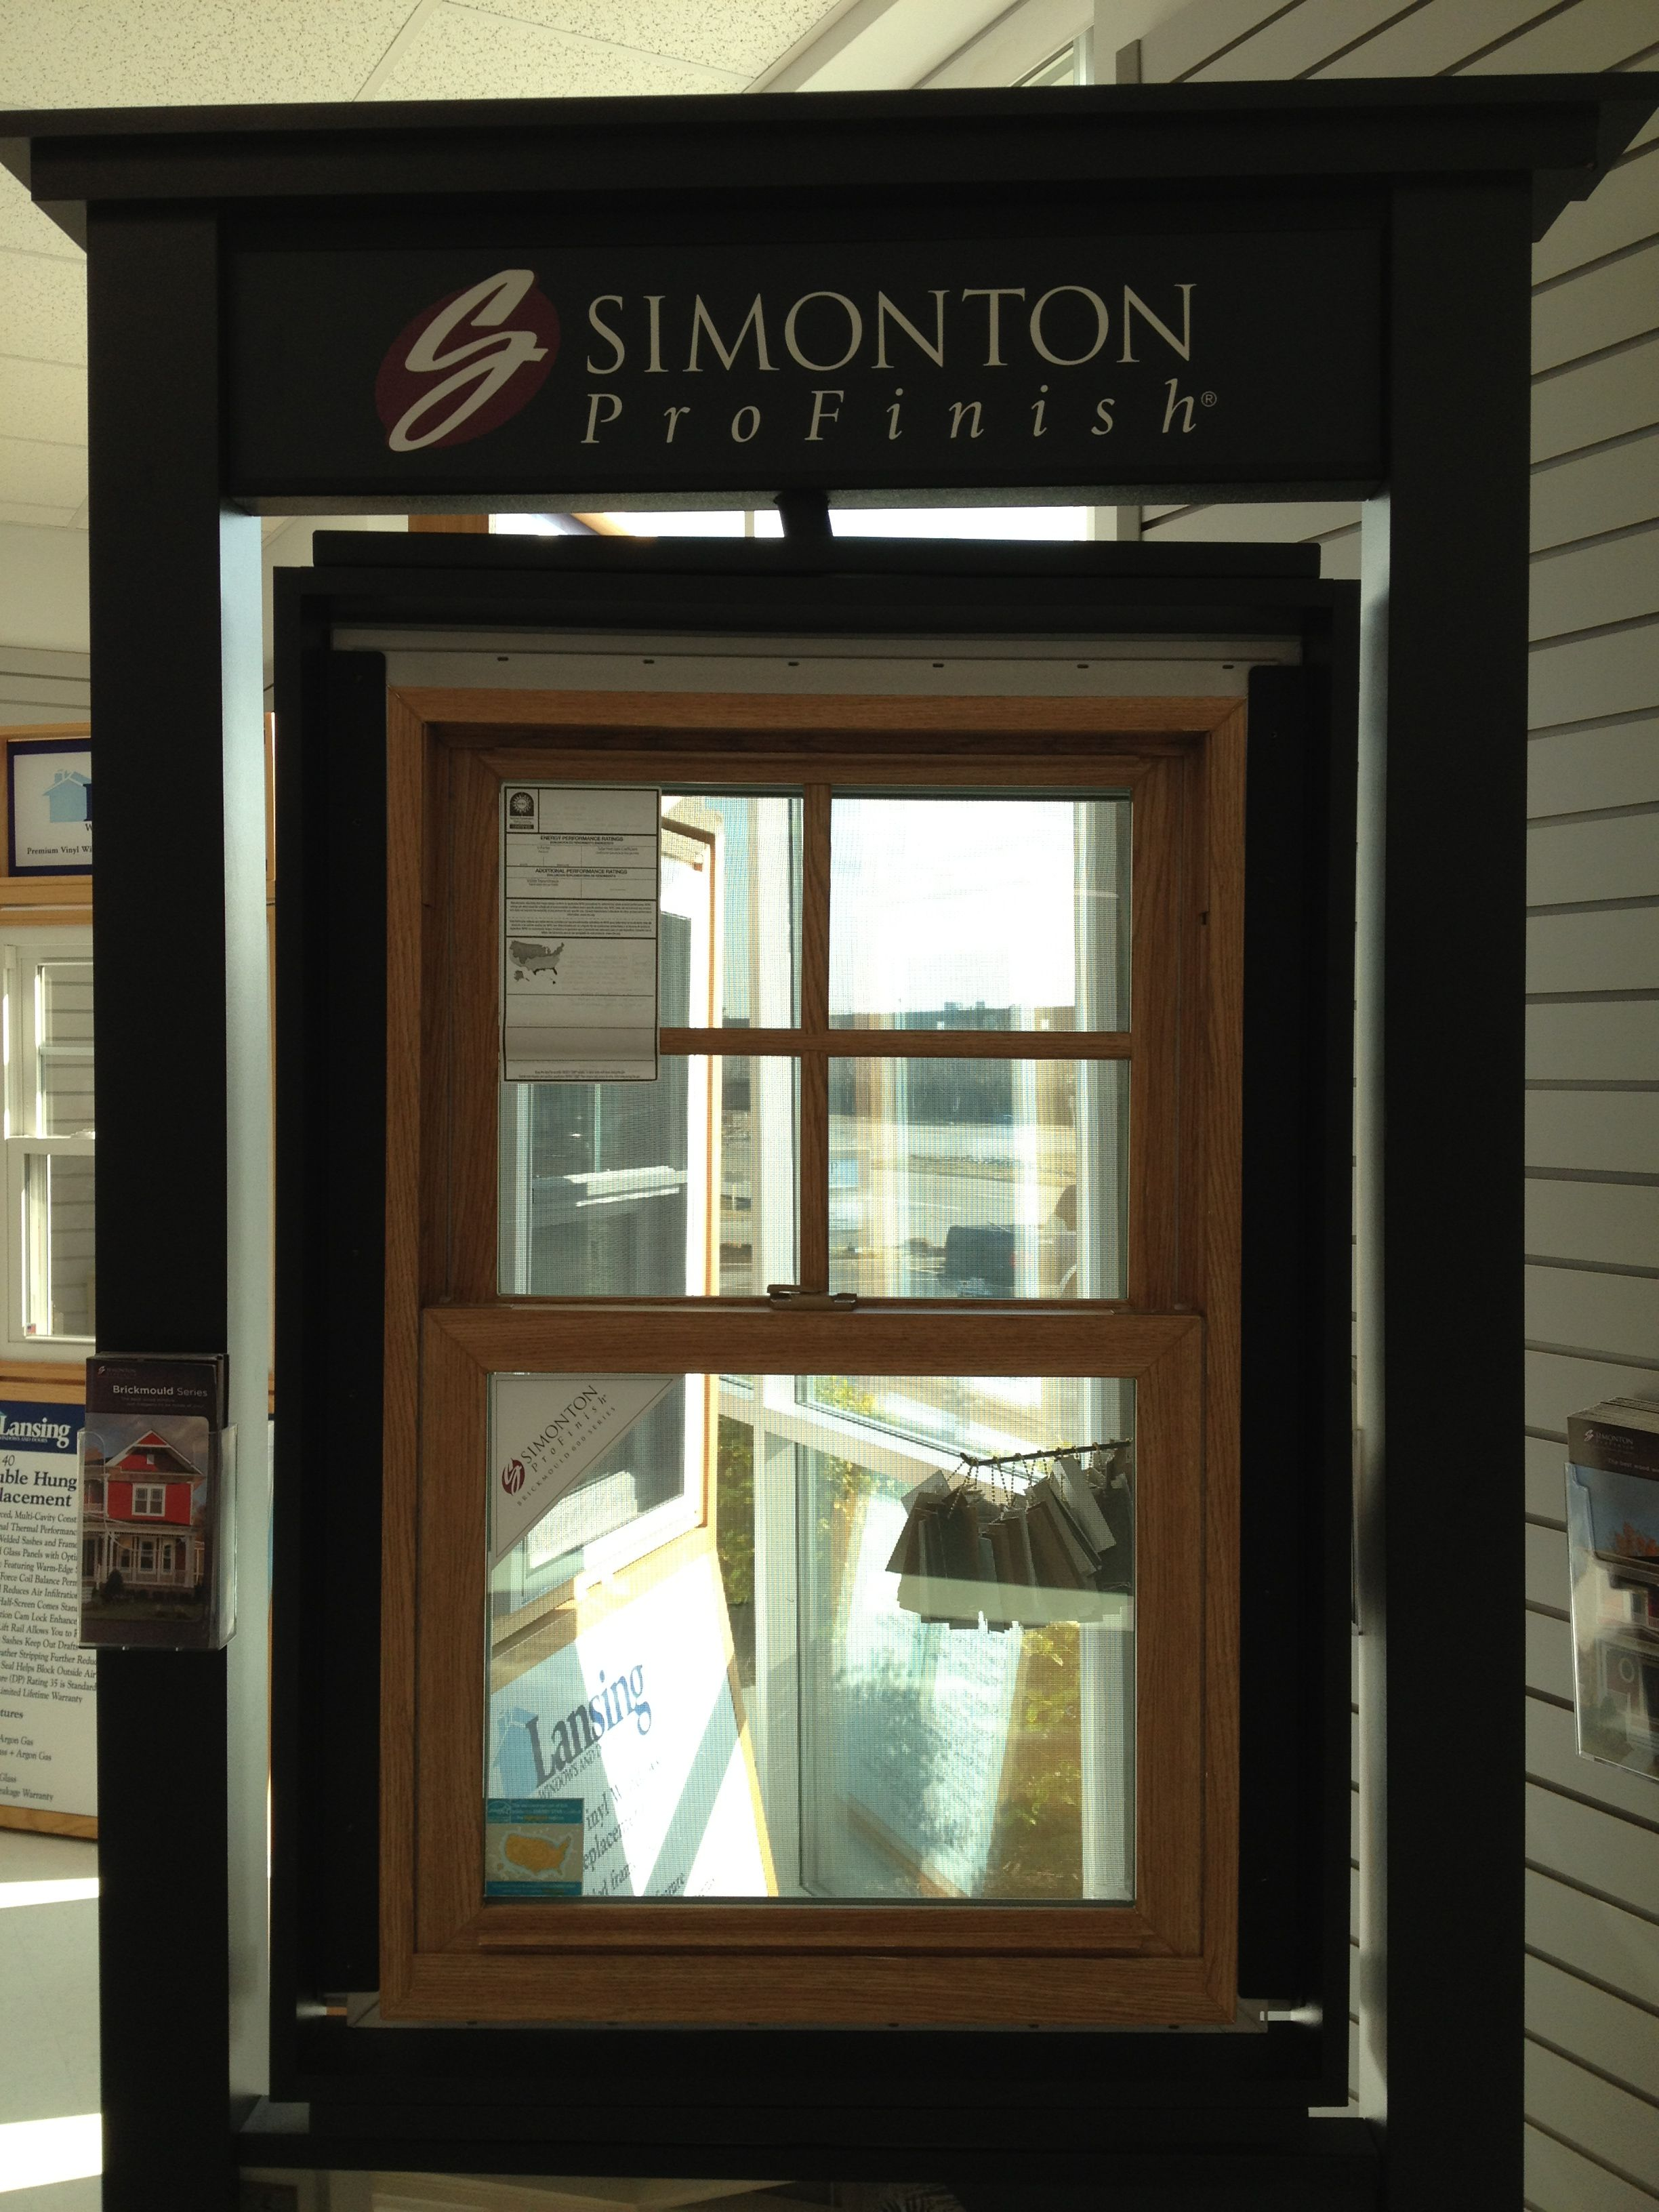 Simonton Profinish Double Hung With Oak Grain Wood Interior On